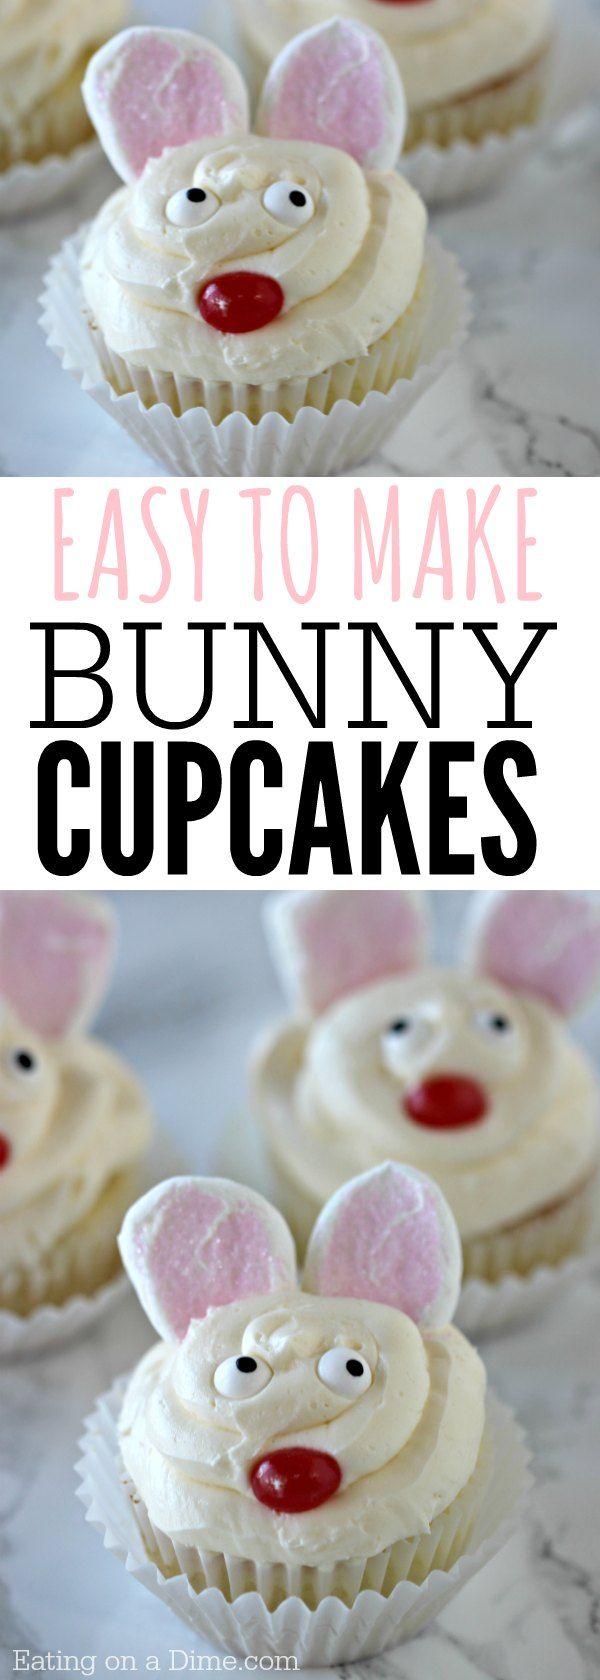 best easter recipes images on pinterest easter recipes baking